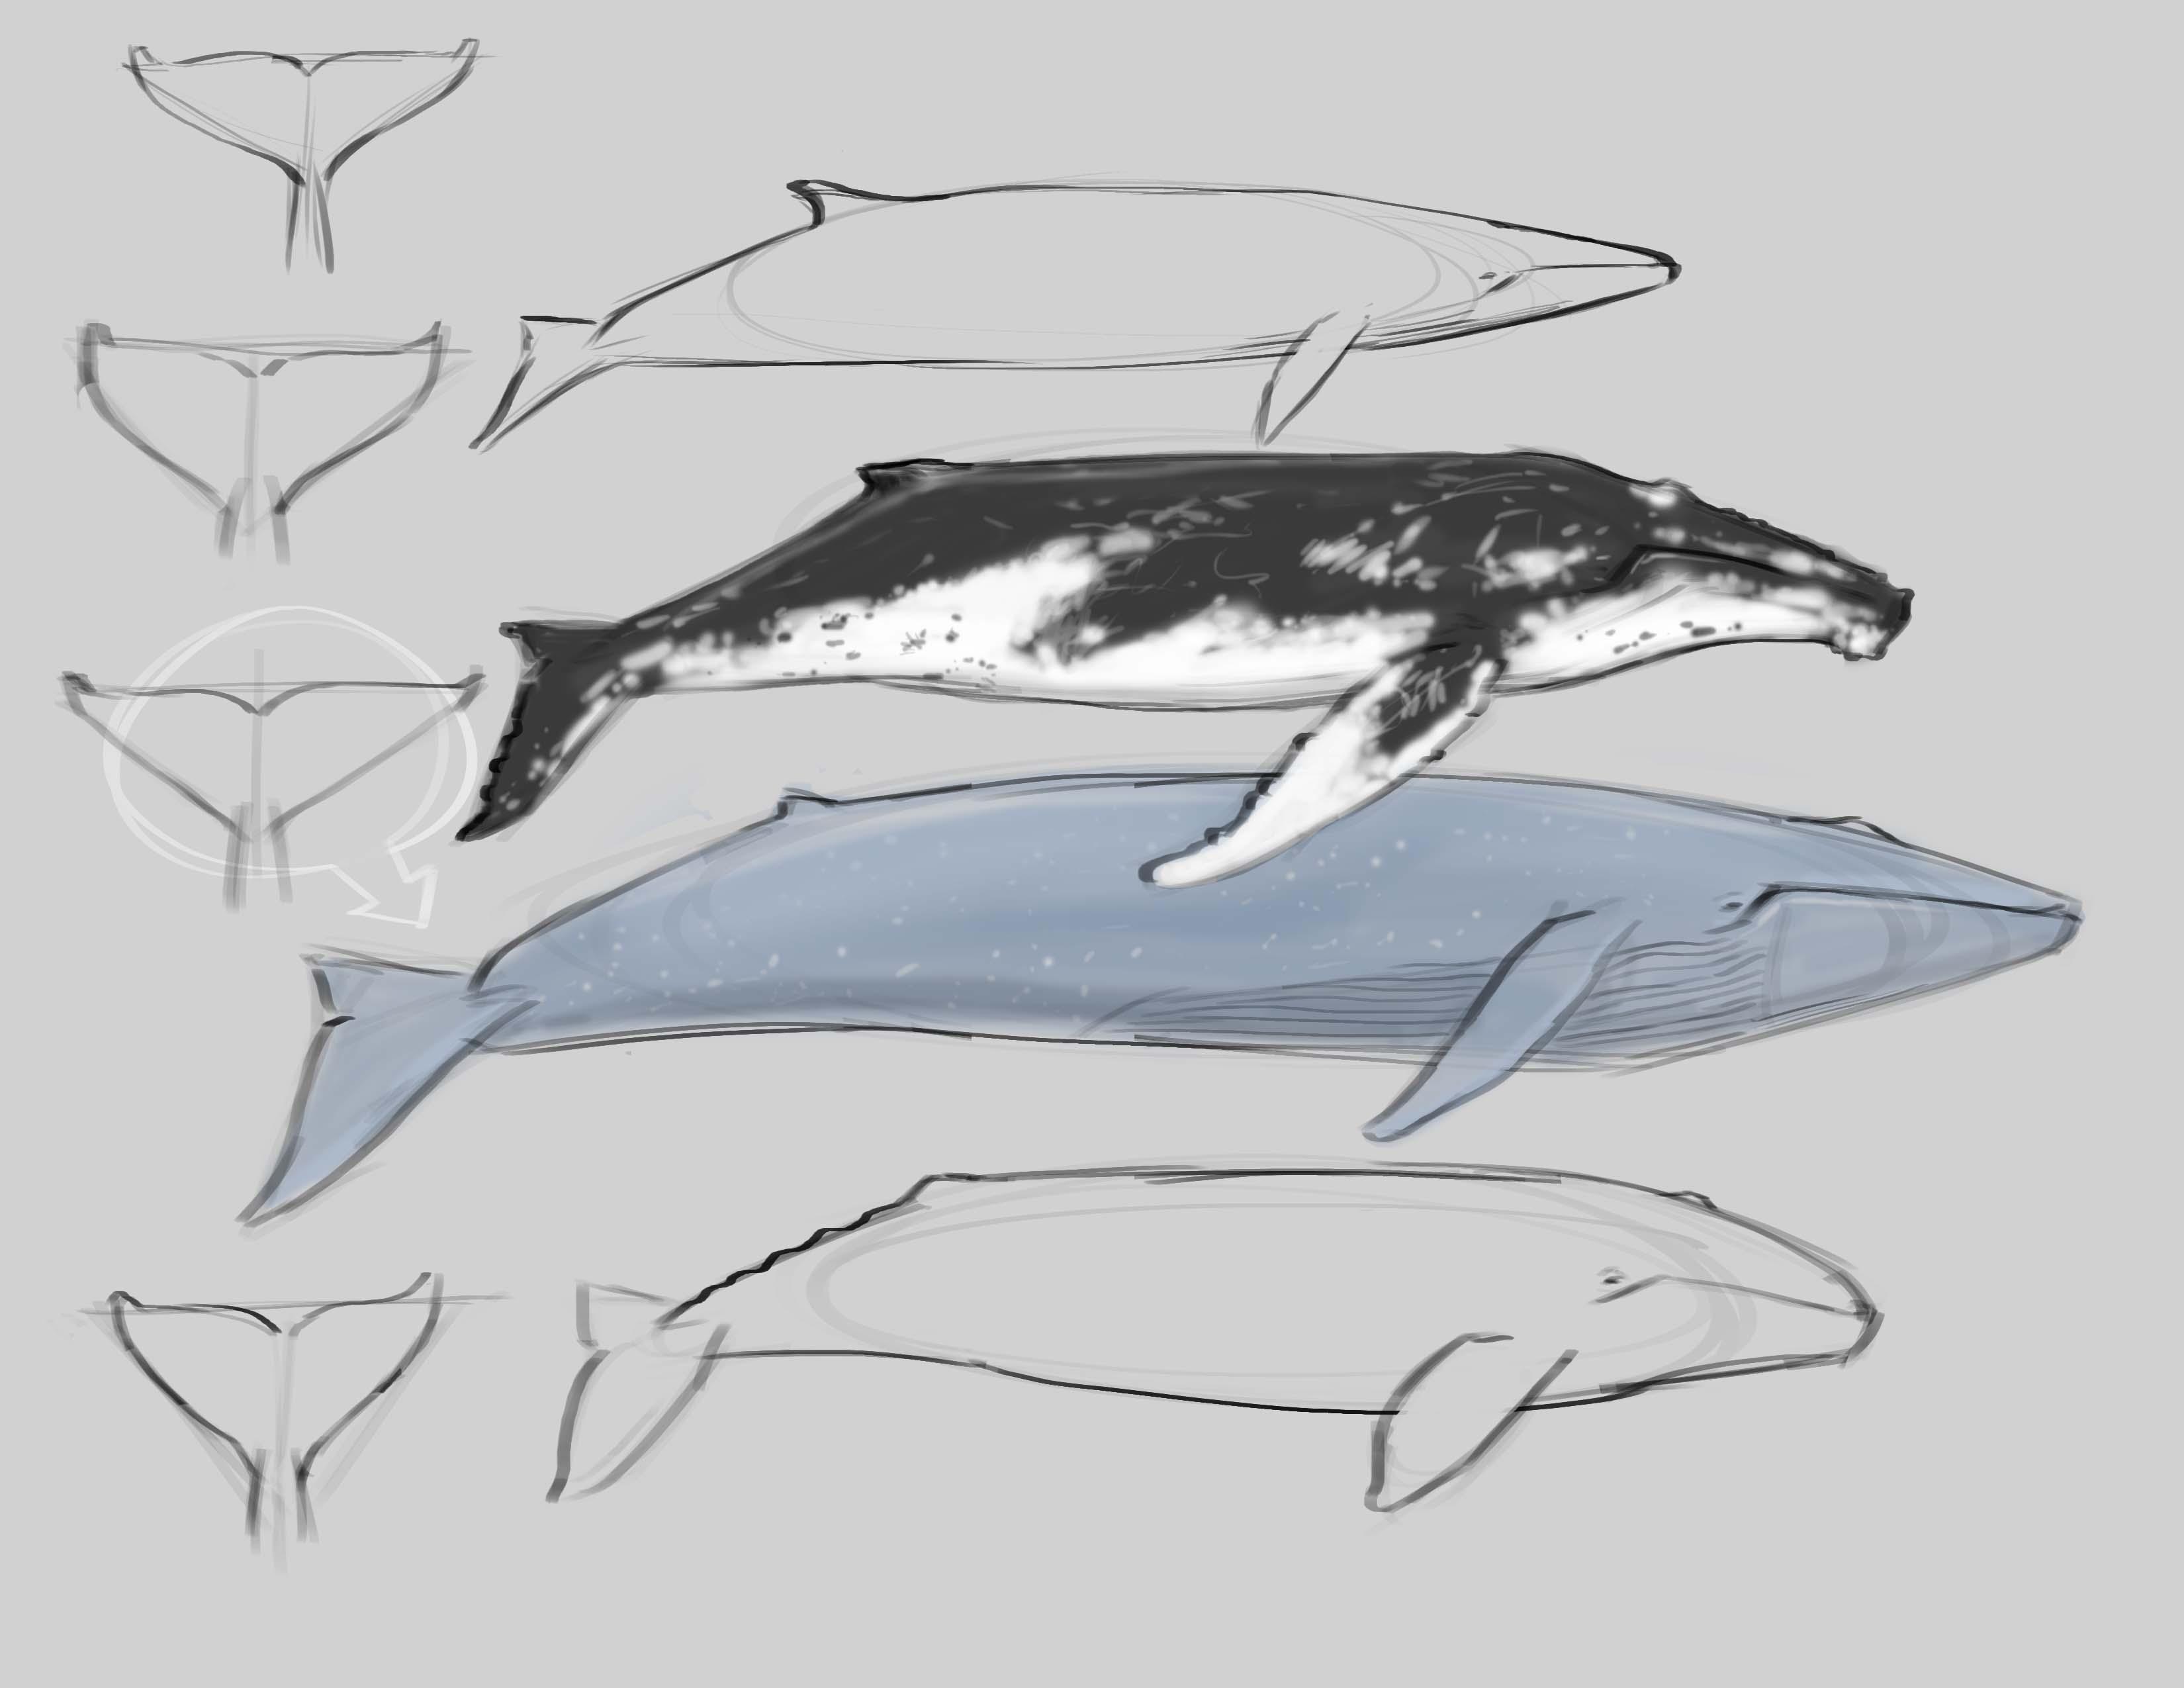 Whale Anatomy 1.12 - John Muir Laws